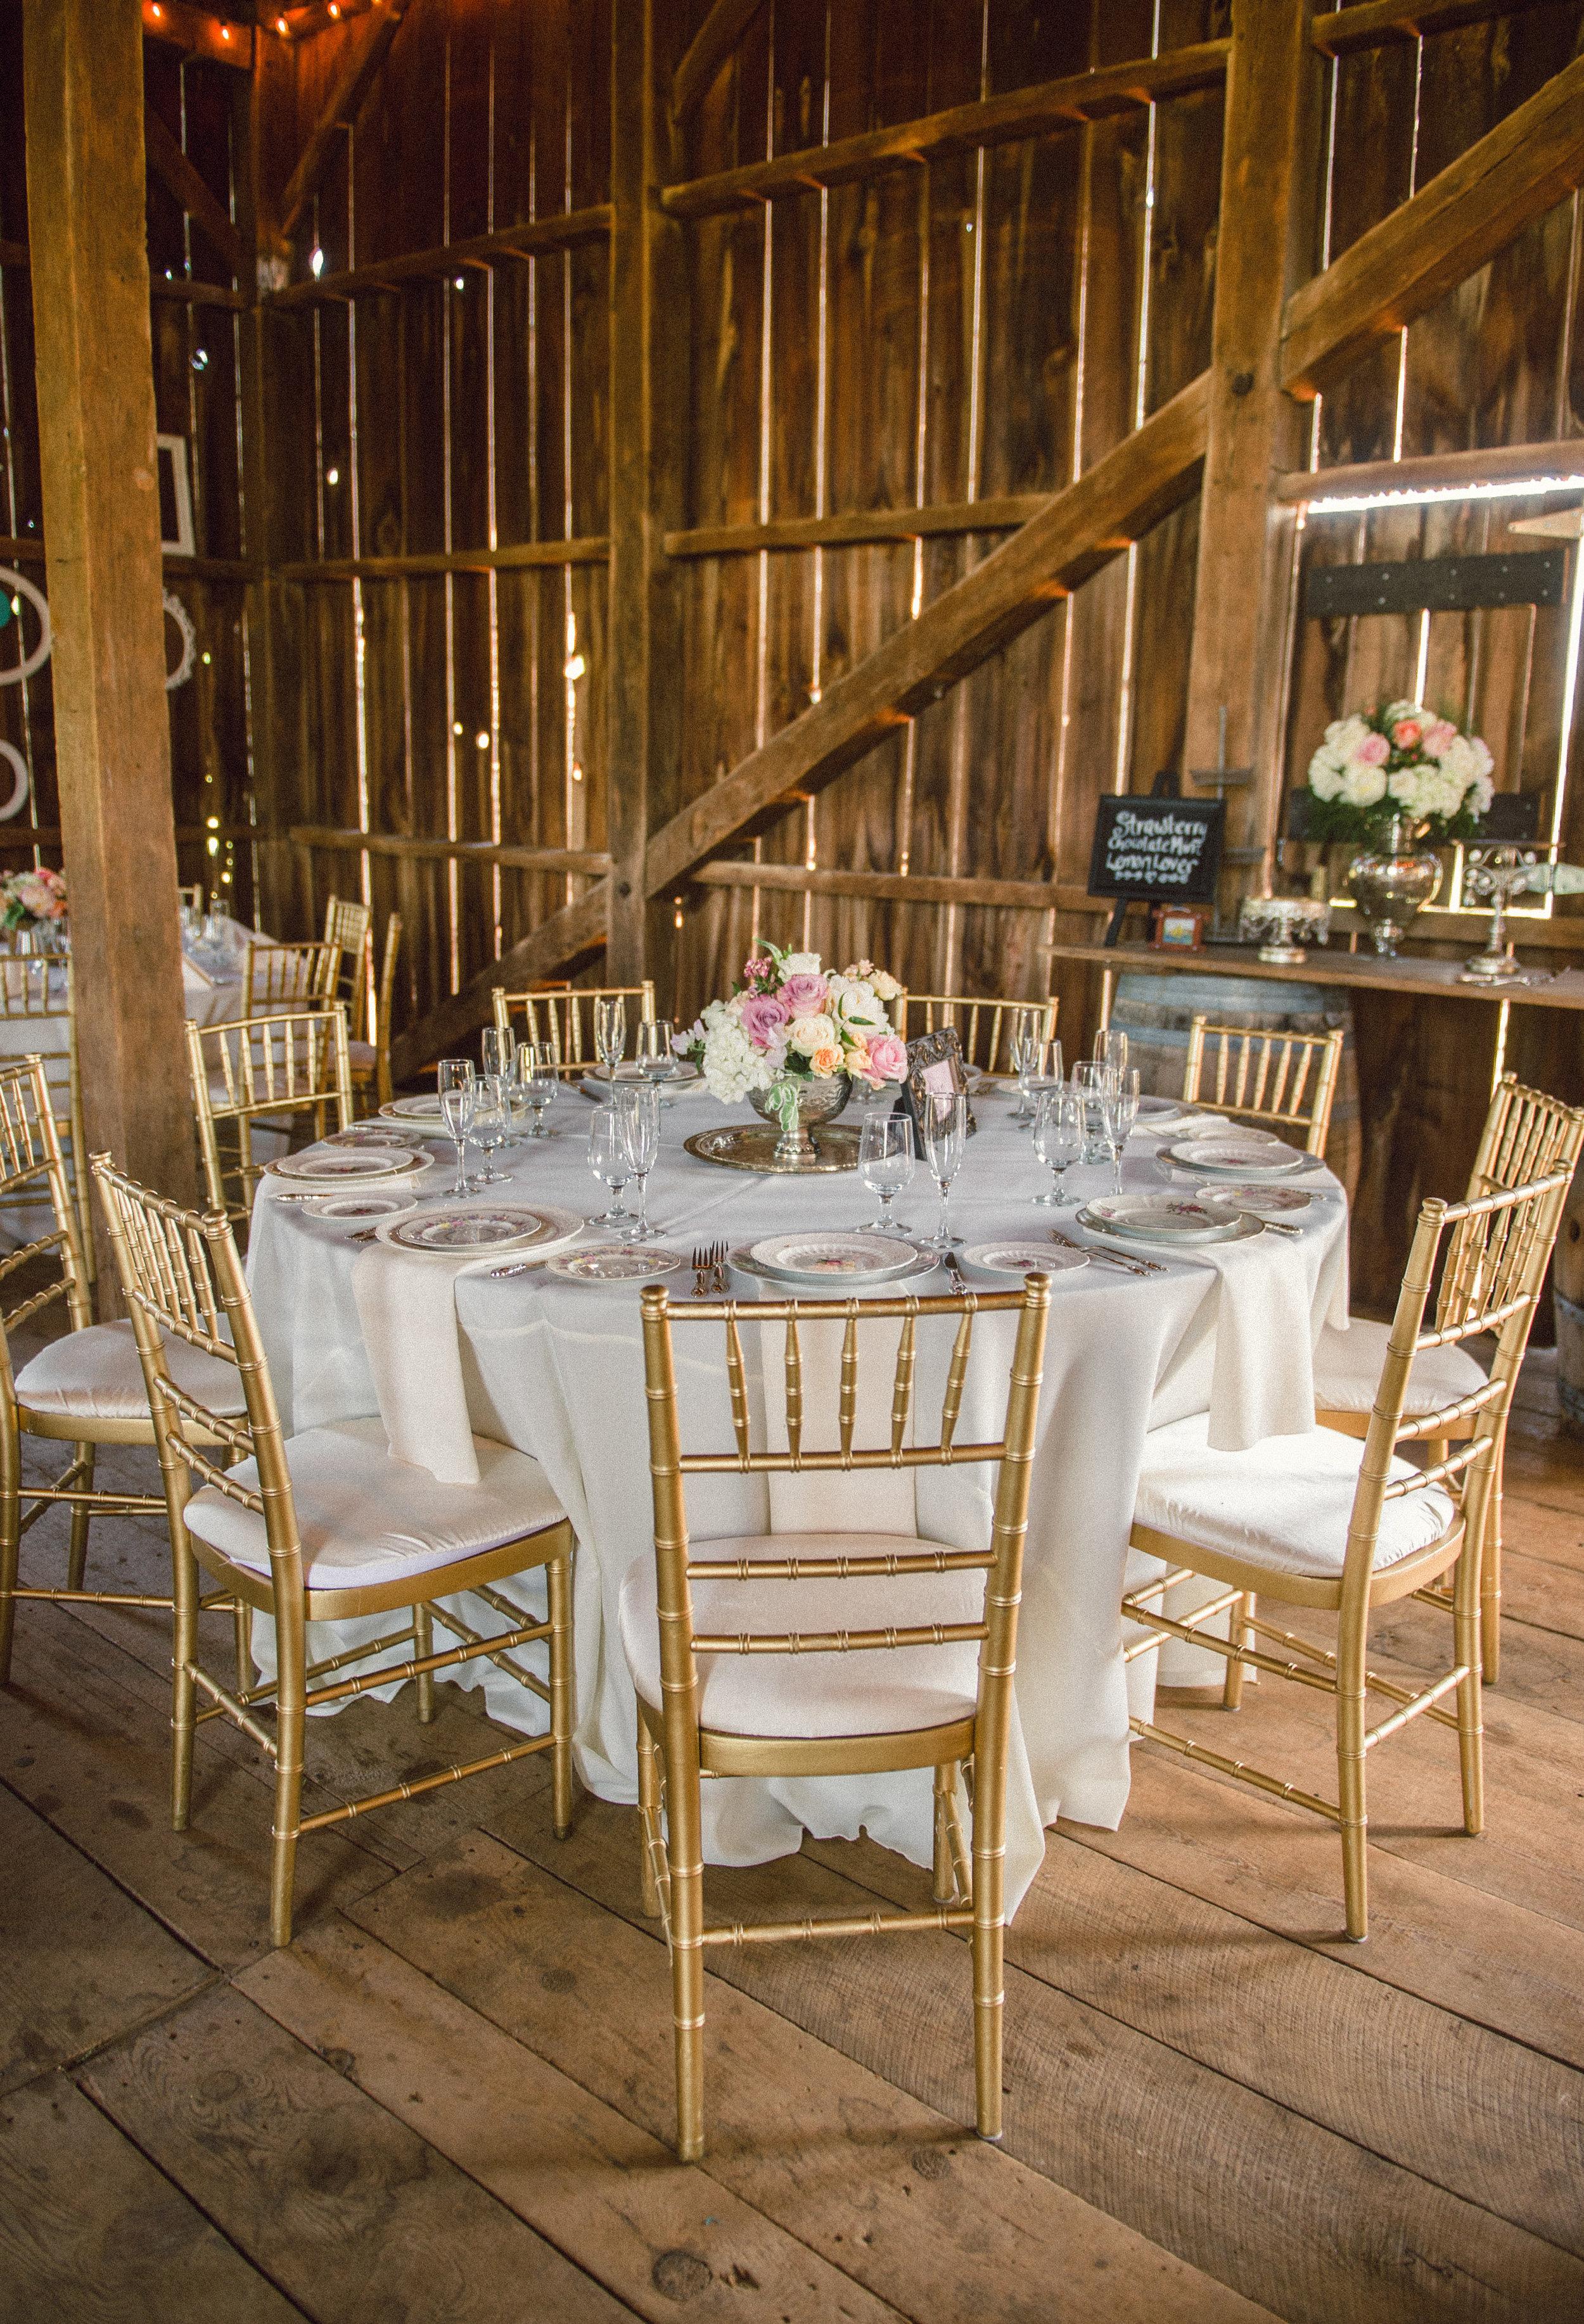 Silverbrook-Farm-Weddings-Virginia-21.jpg